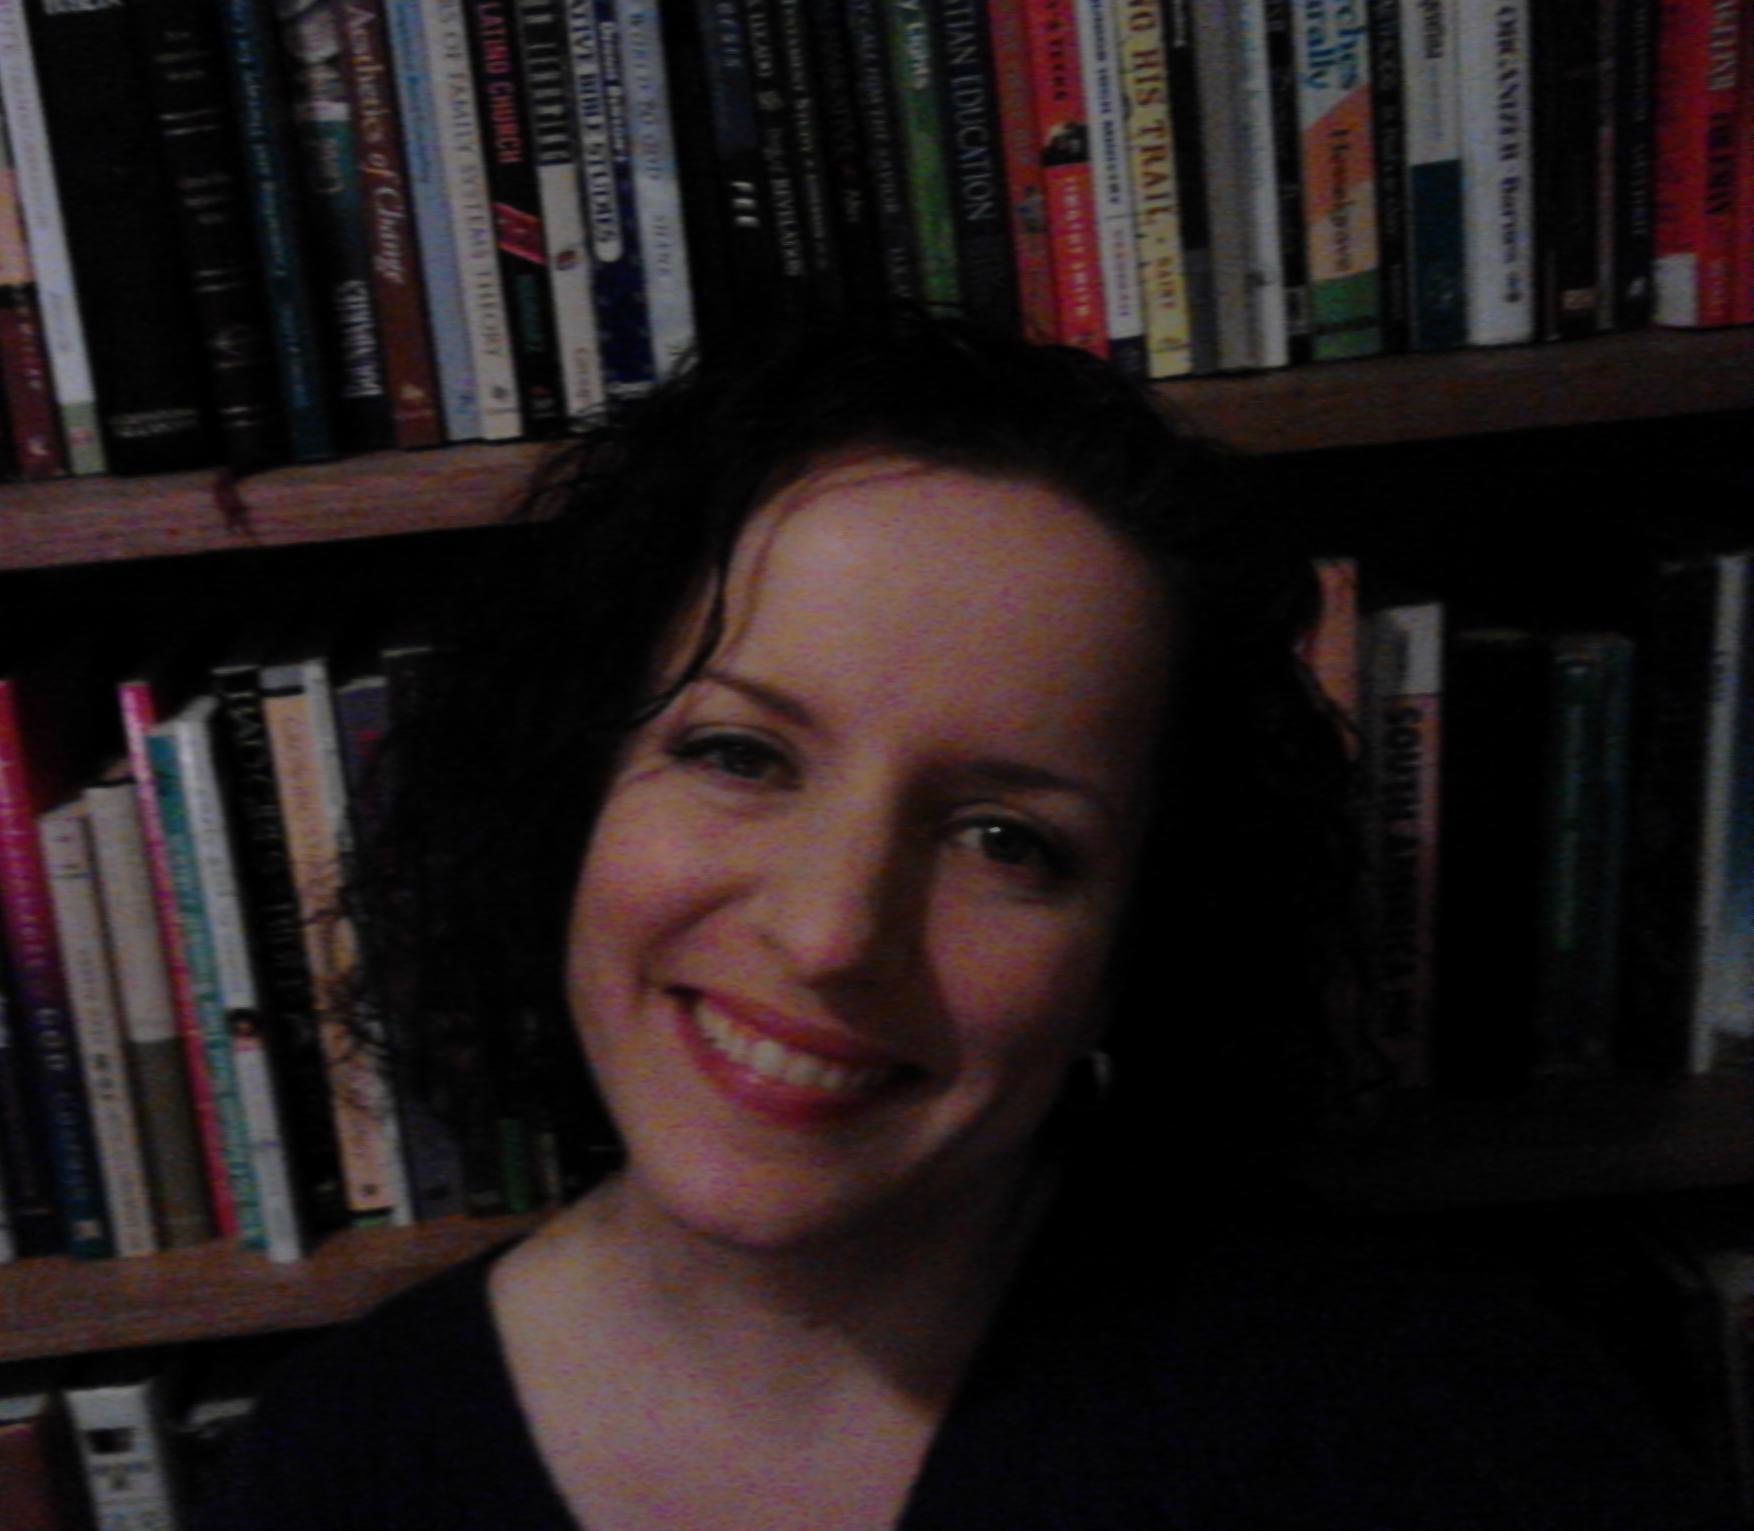 Meet the Staff: Angela Rusk